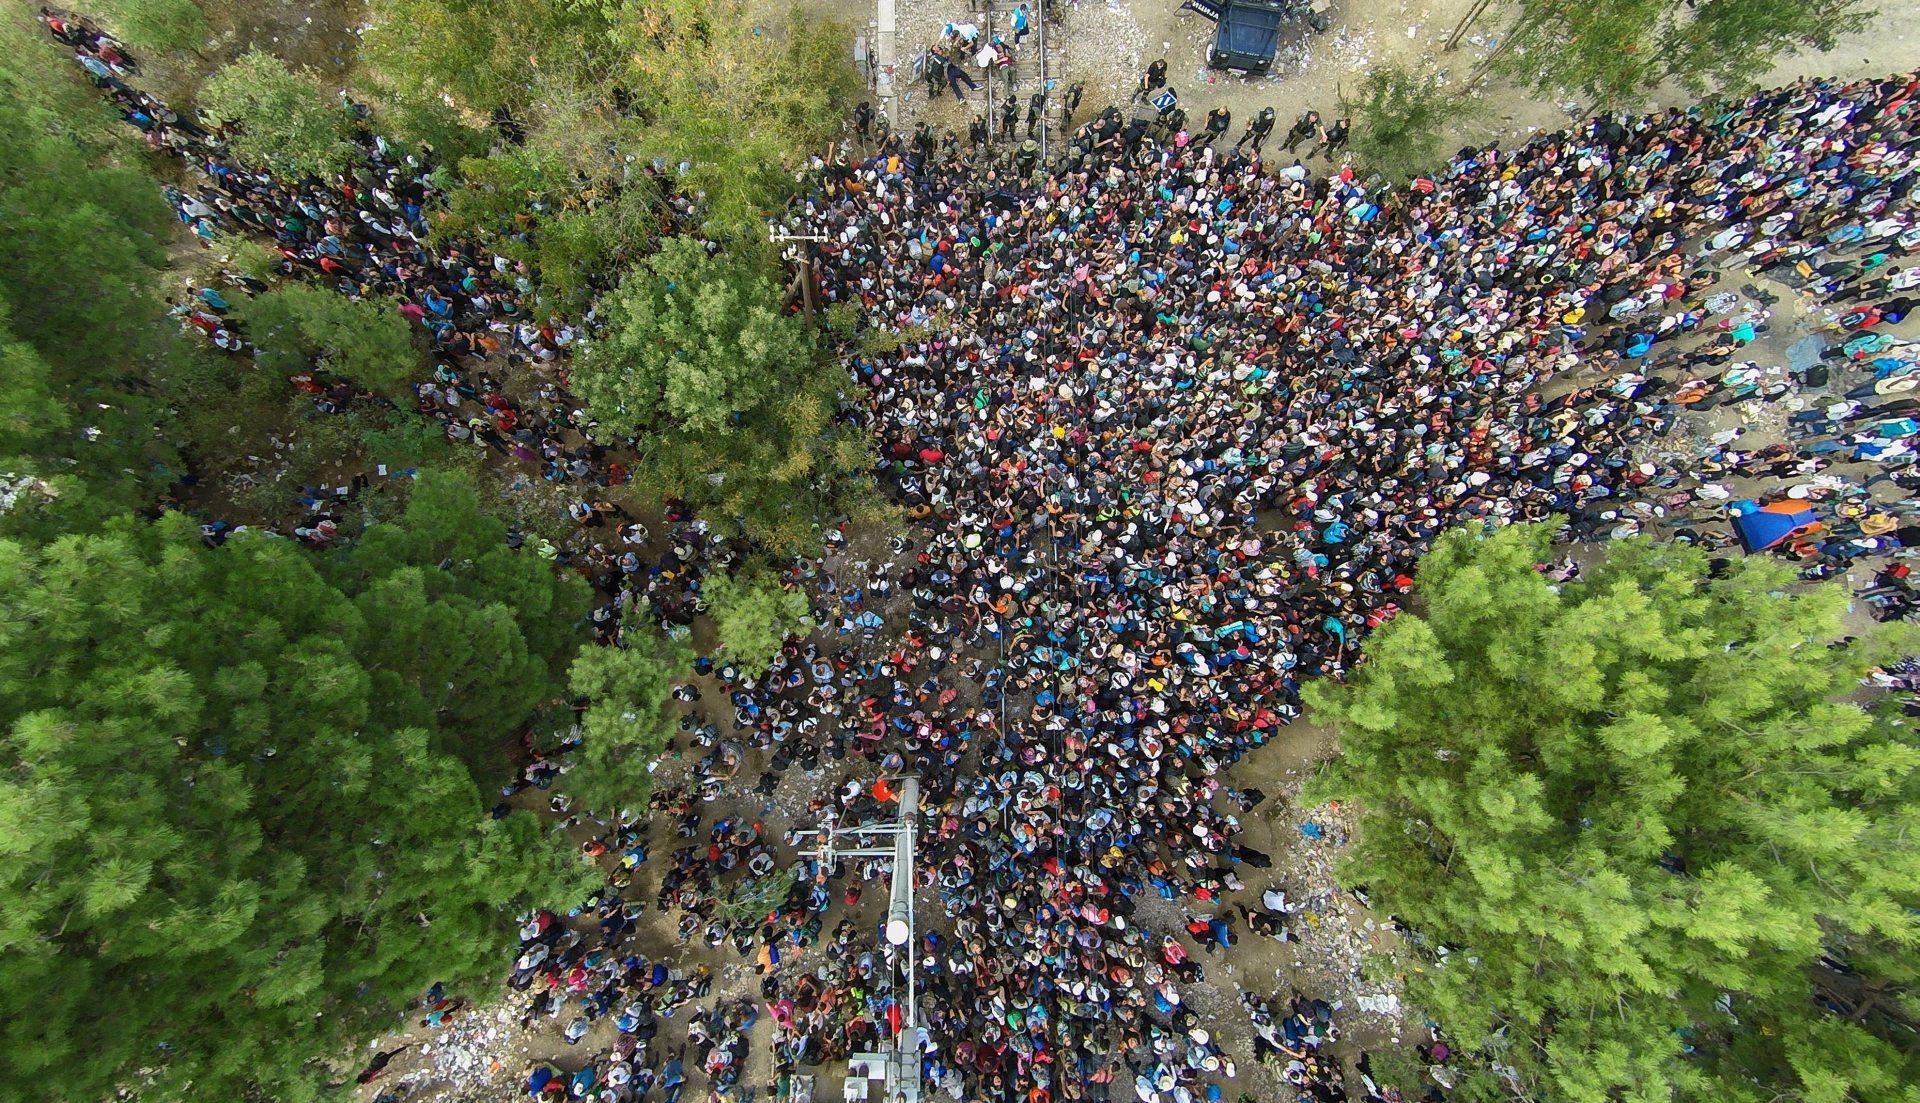 Beč: Izbjeglička kriza zasjenjuje druge teme konferencije o zapadnom Balkanu